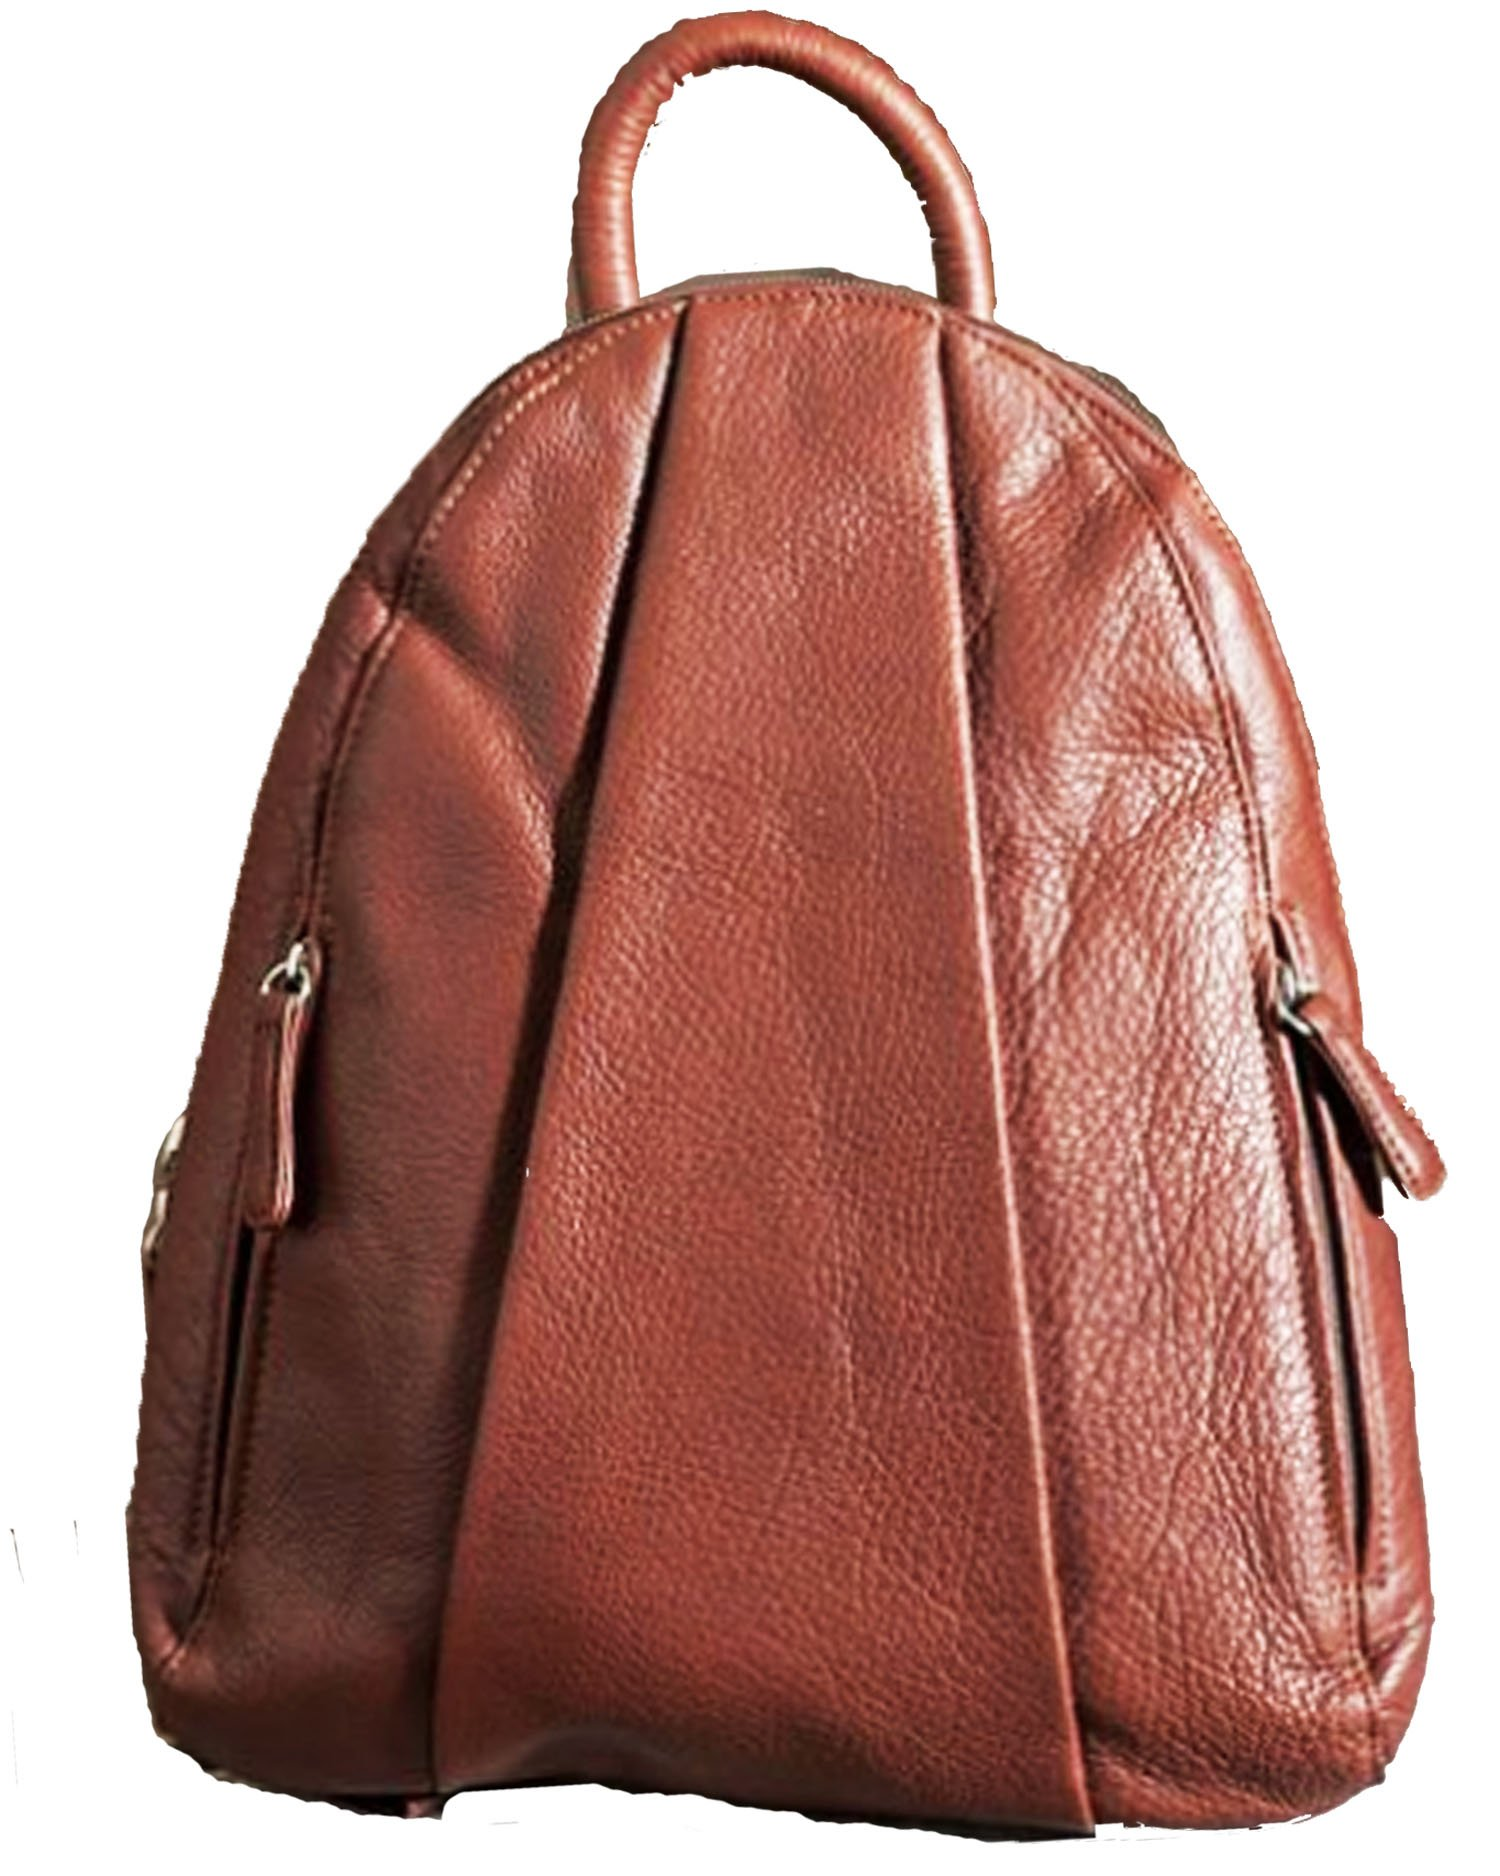 Women's Osgoode Marley Teardrop Leather Backpack Handbag,1 Size,BRANDY